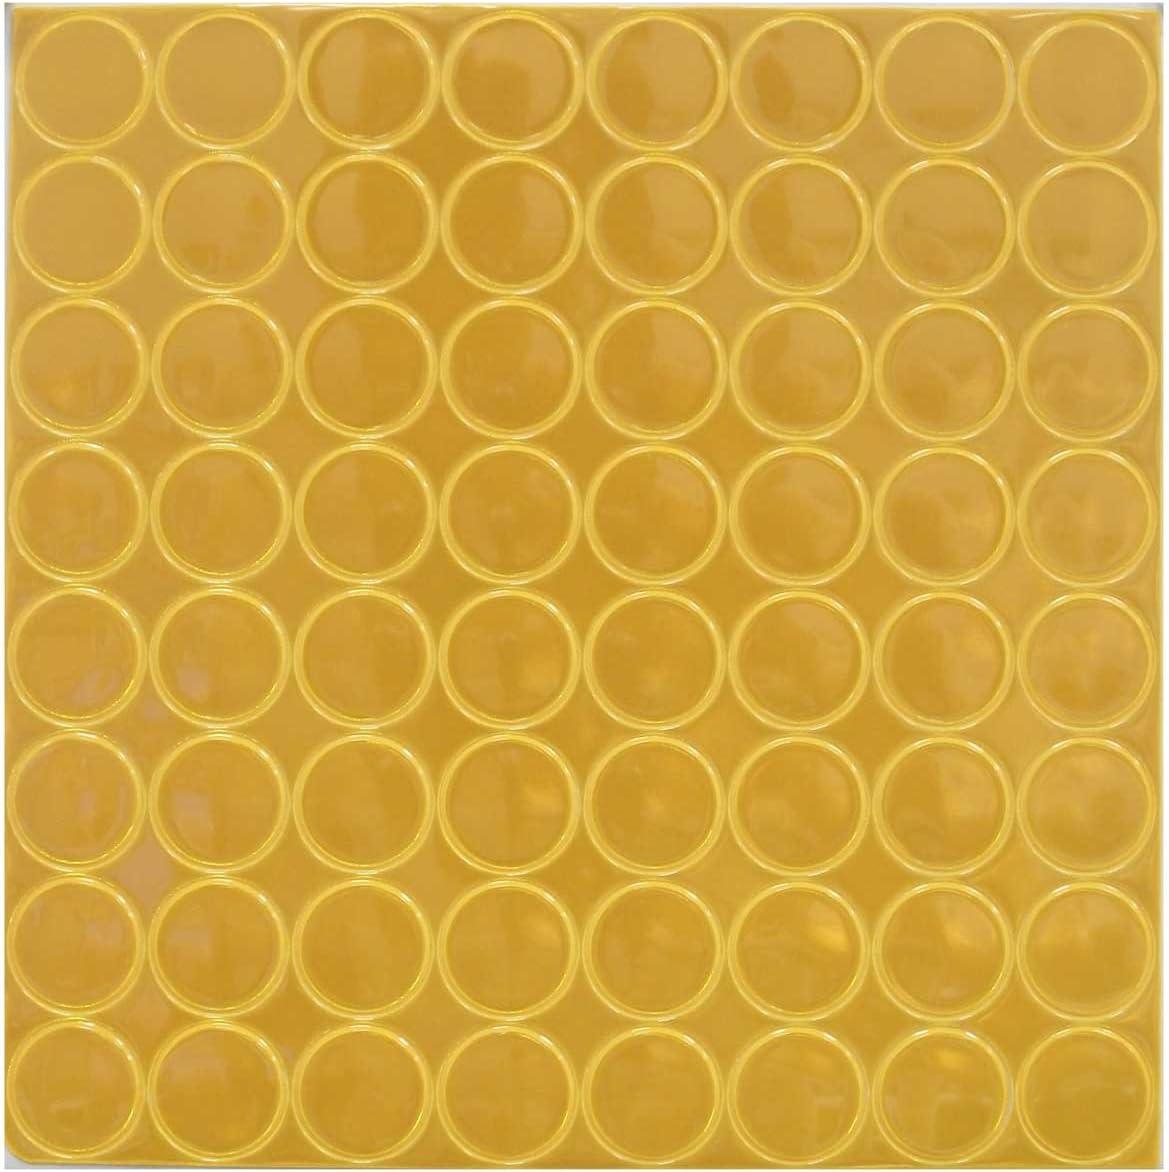 10 mm Round Dots Self Adhesive Neon Yellow Vinyl Luminous PVC Film Coding Dots 612 Sticky Dots